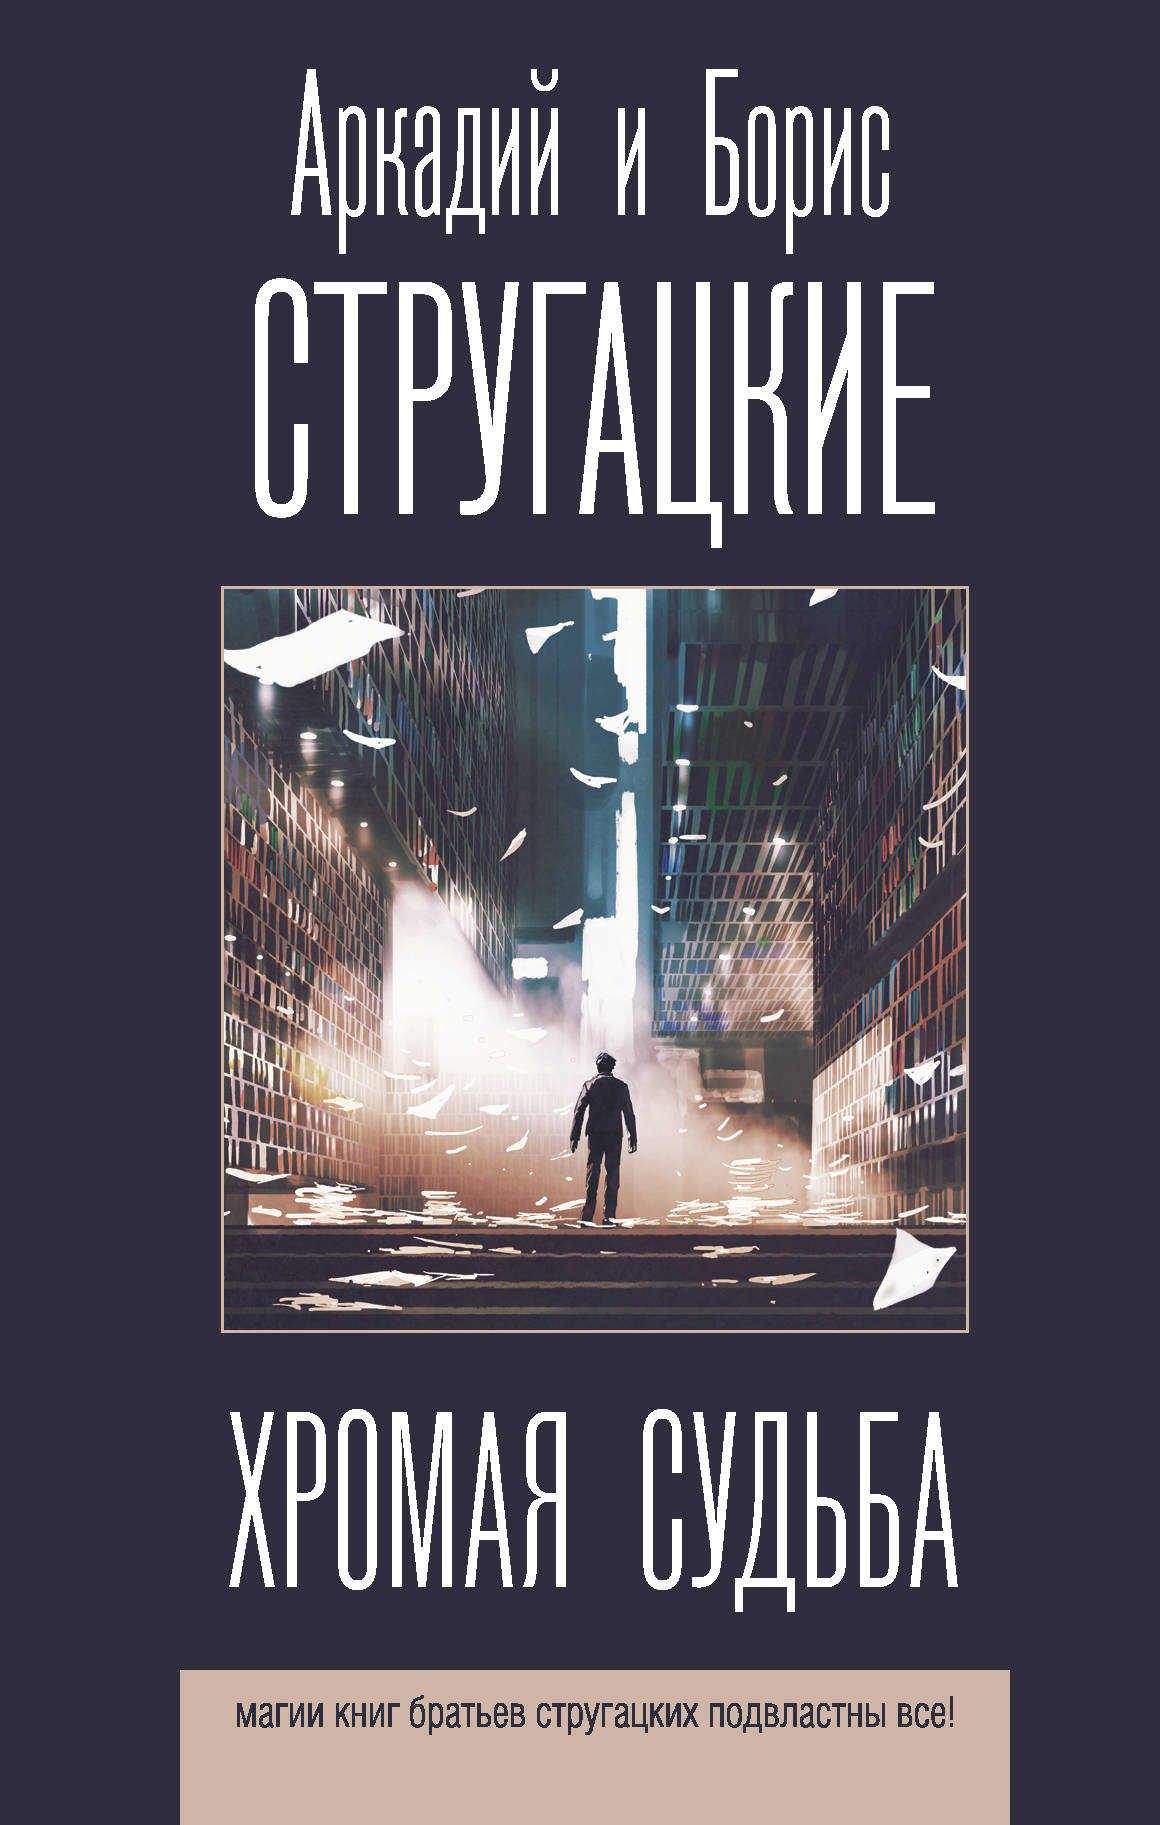 Хромая судьба: Фантастический роман